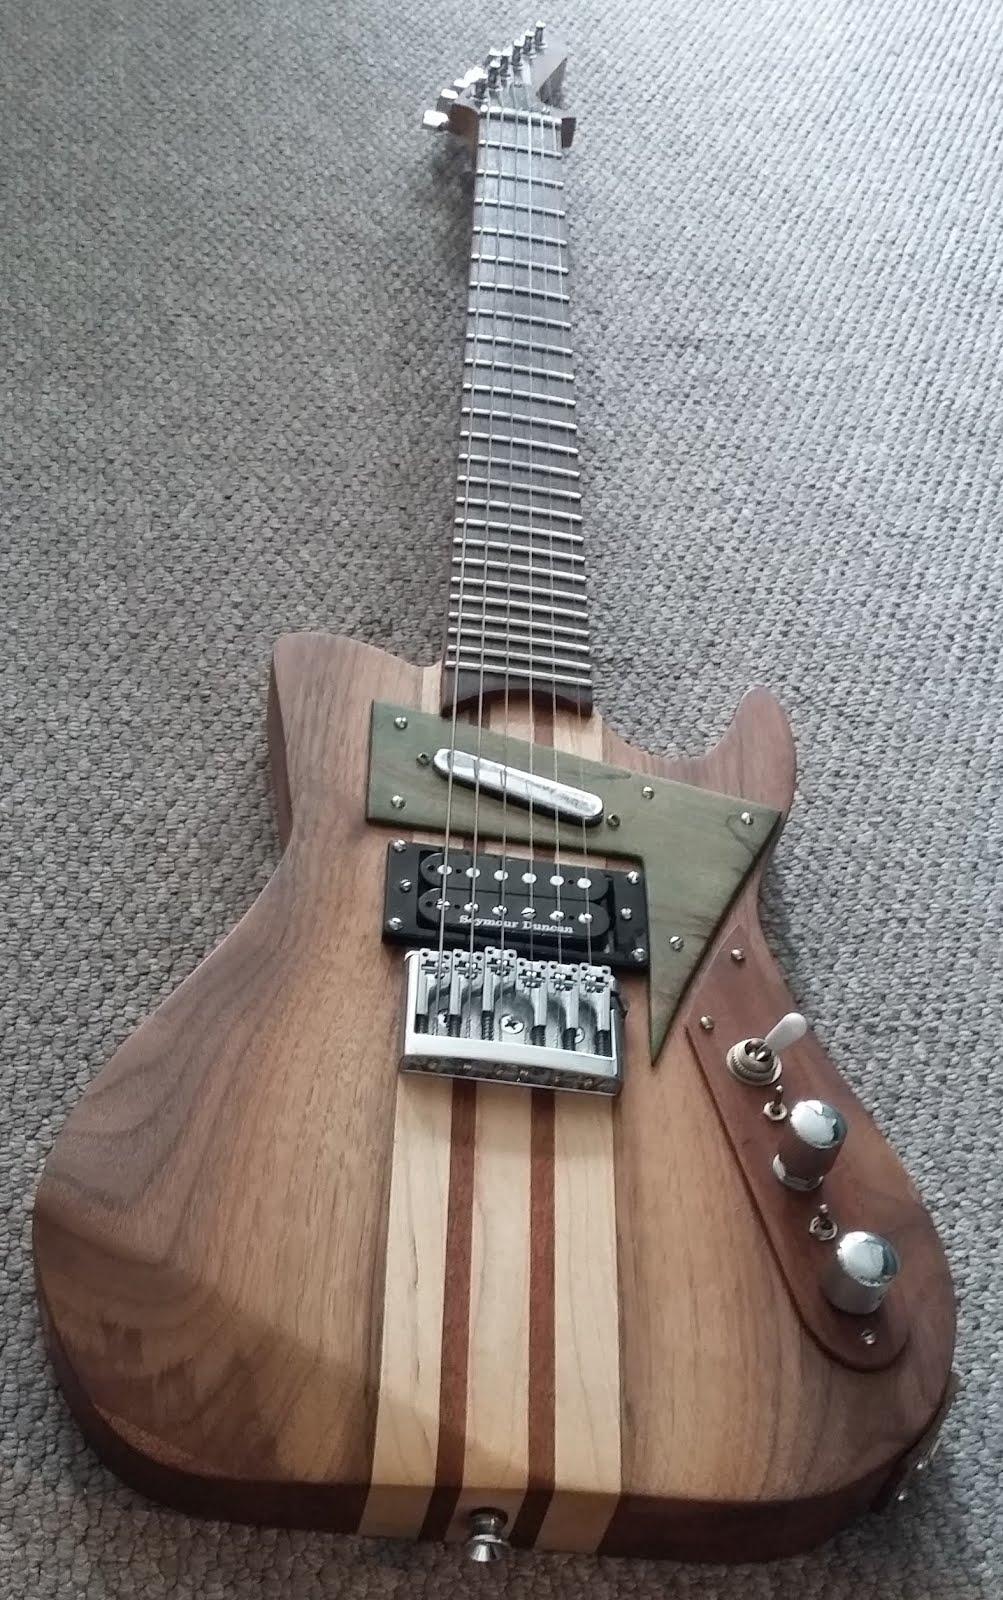 Sb3 Sbc Guitars Rewiring A Semihollow Guitar Part Two Youtube The Green Machine In Its Original State